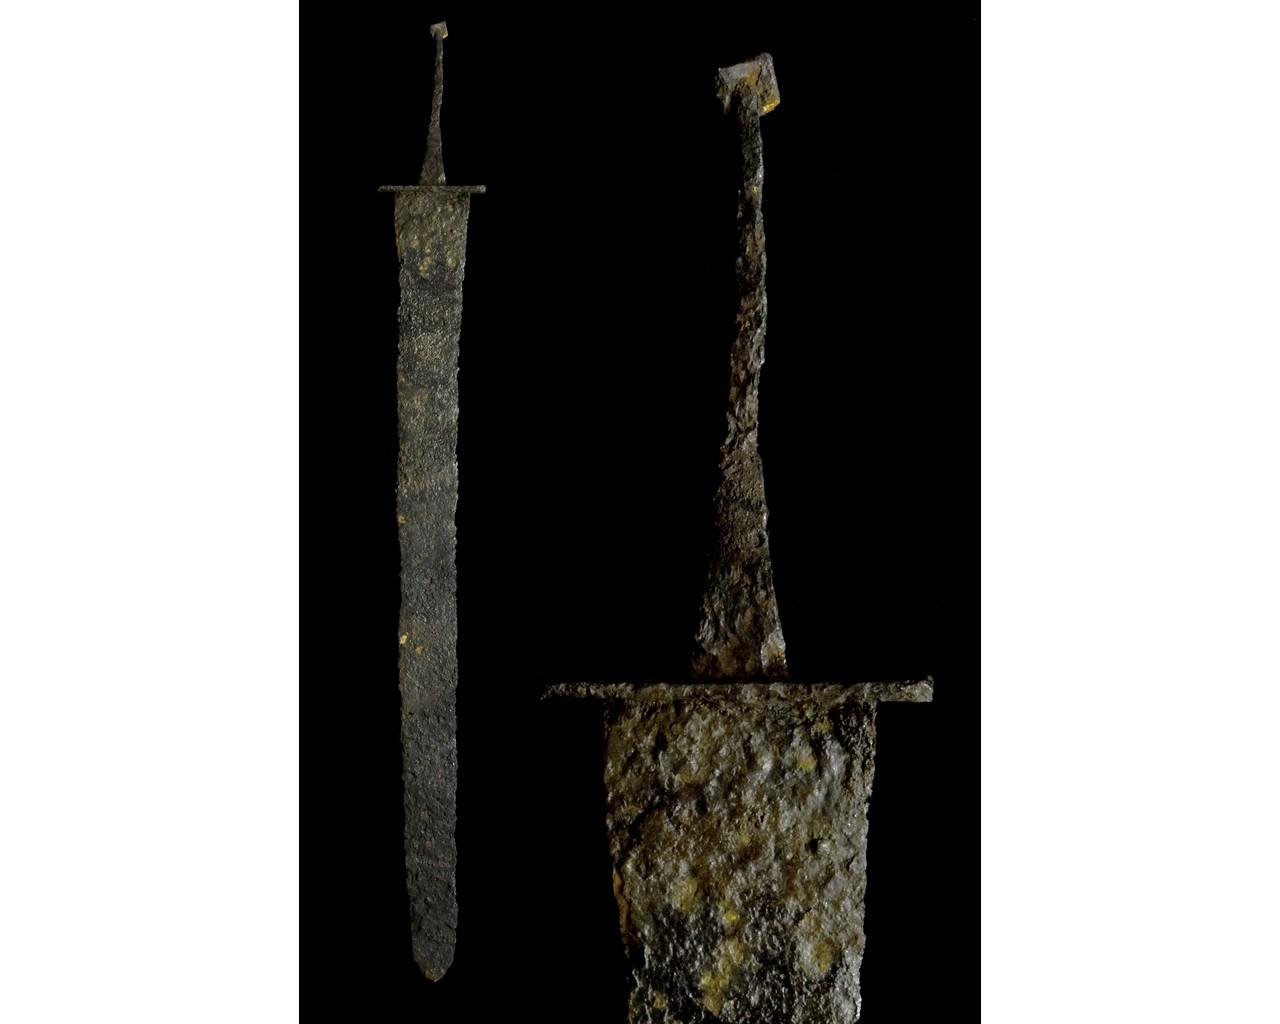 LATE ROMAN IRON SPATHA SWORD